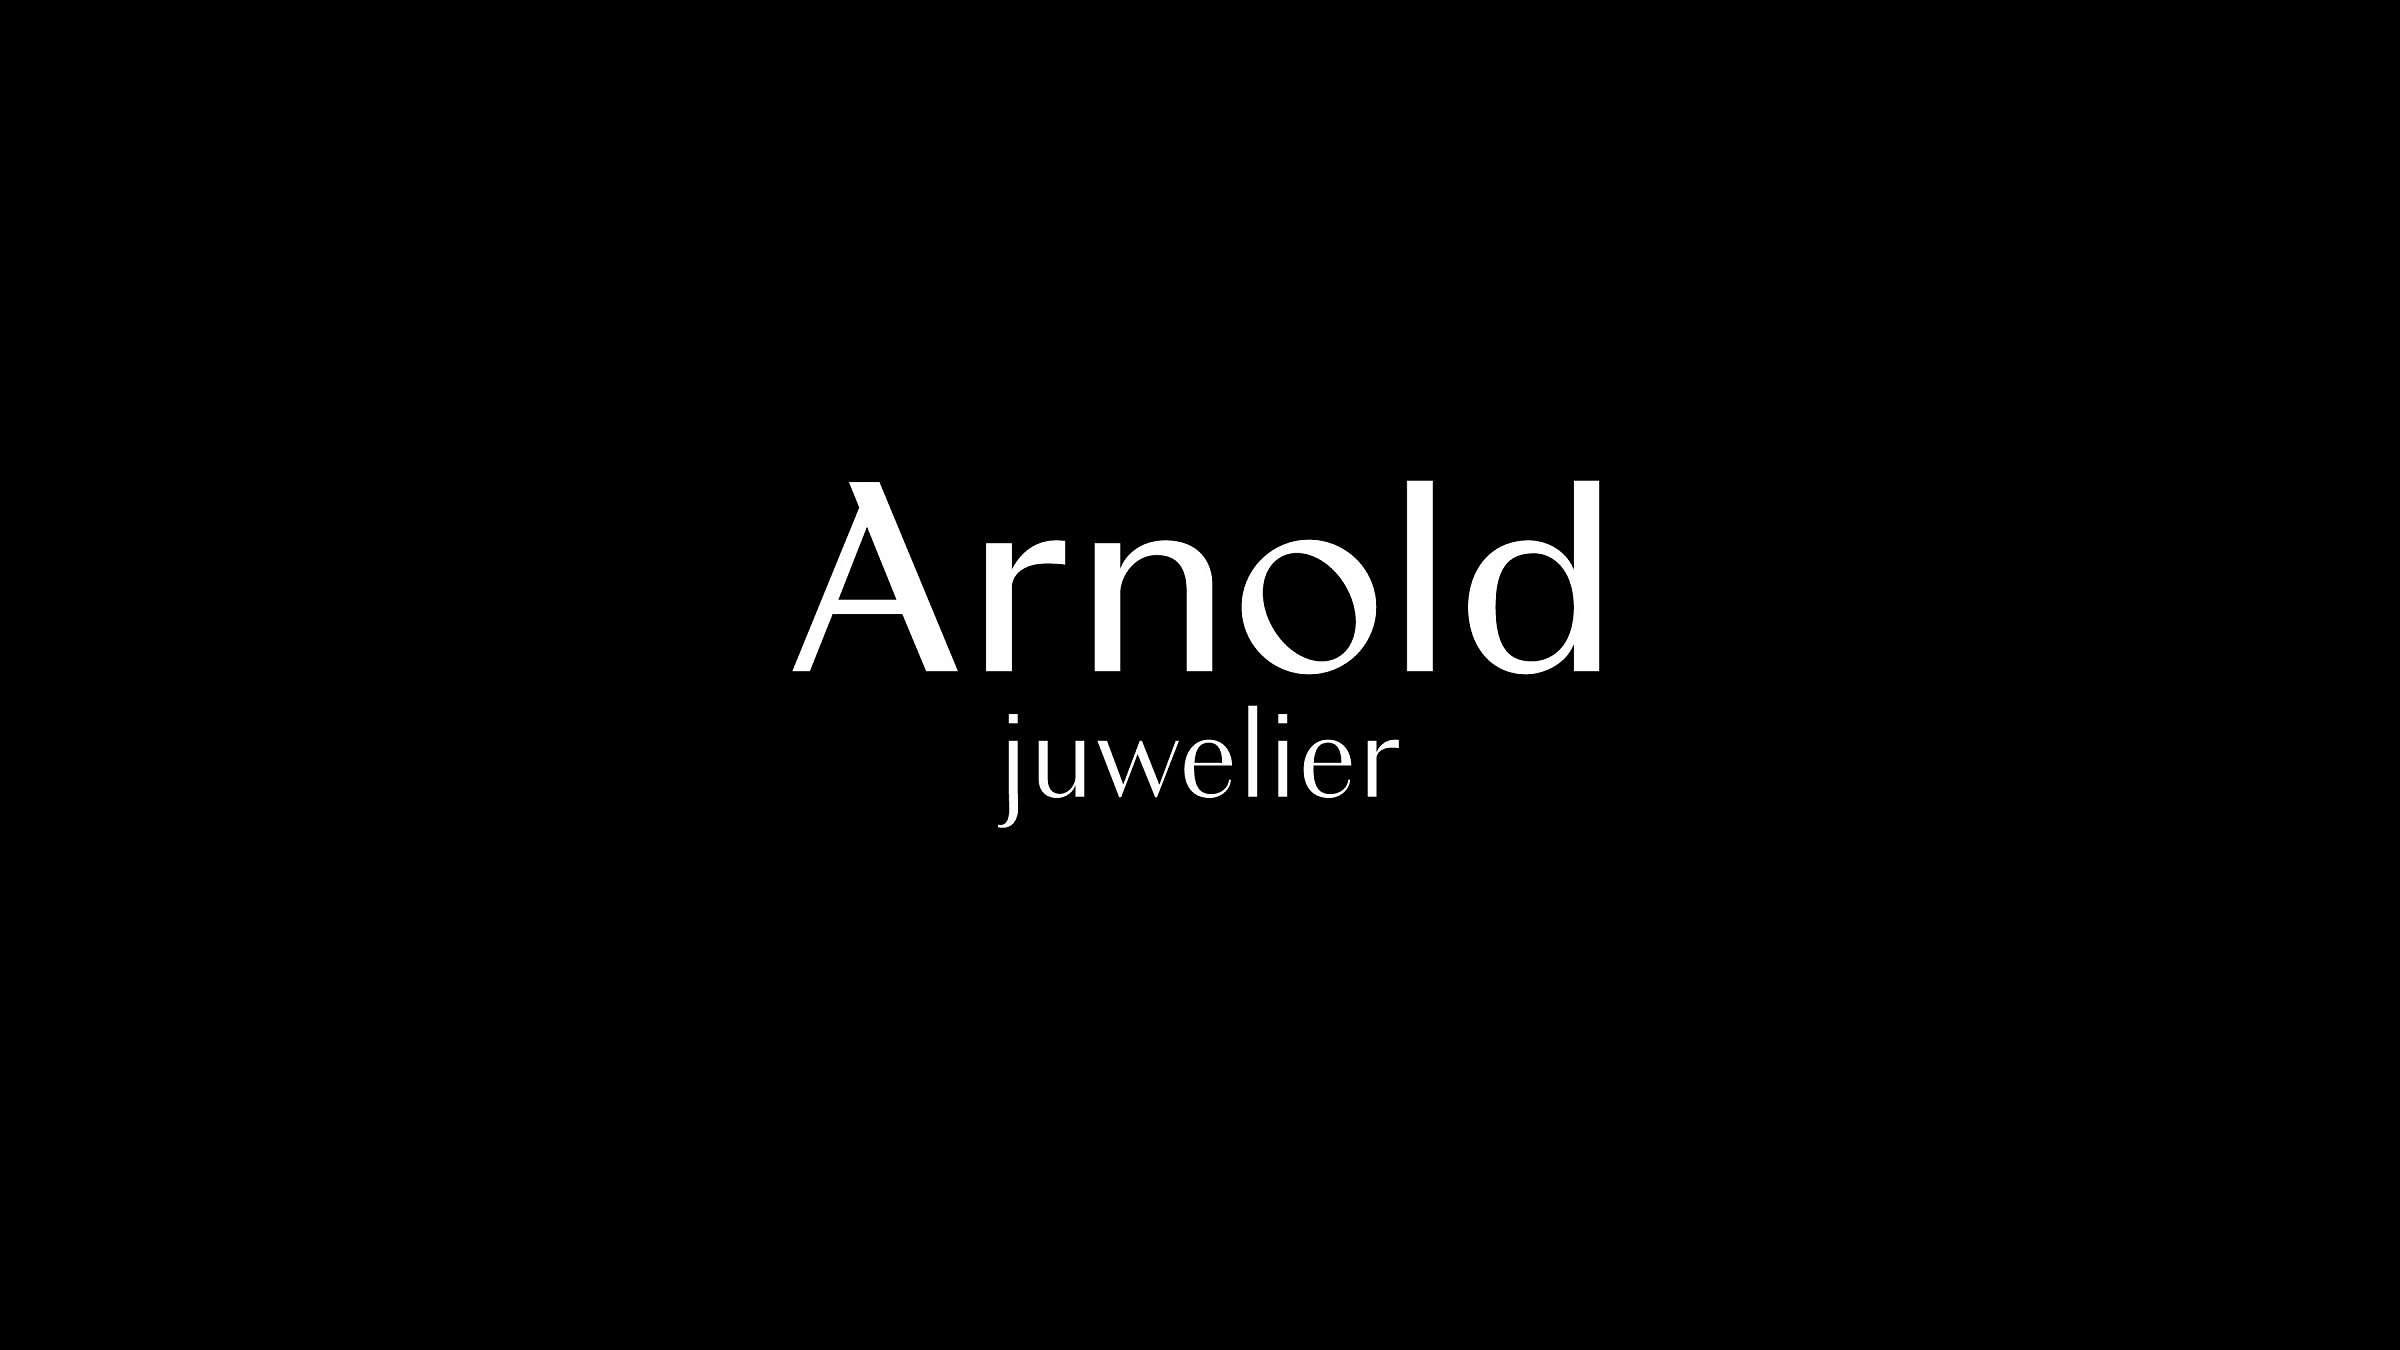 Arnold Juwelier